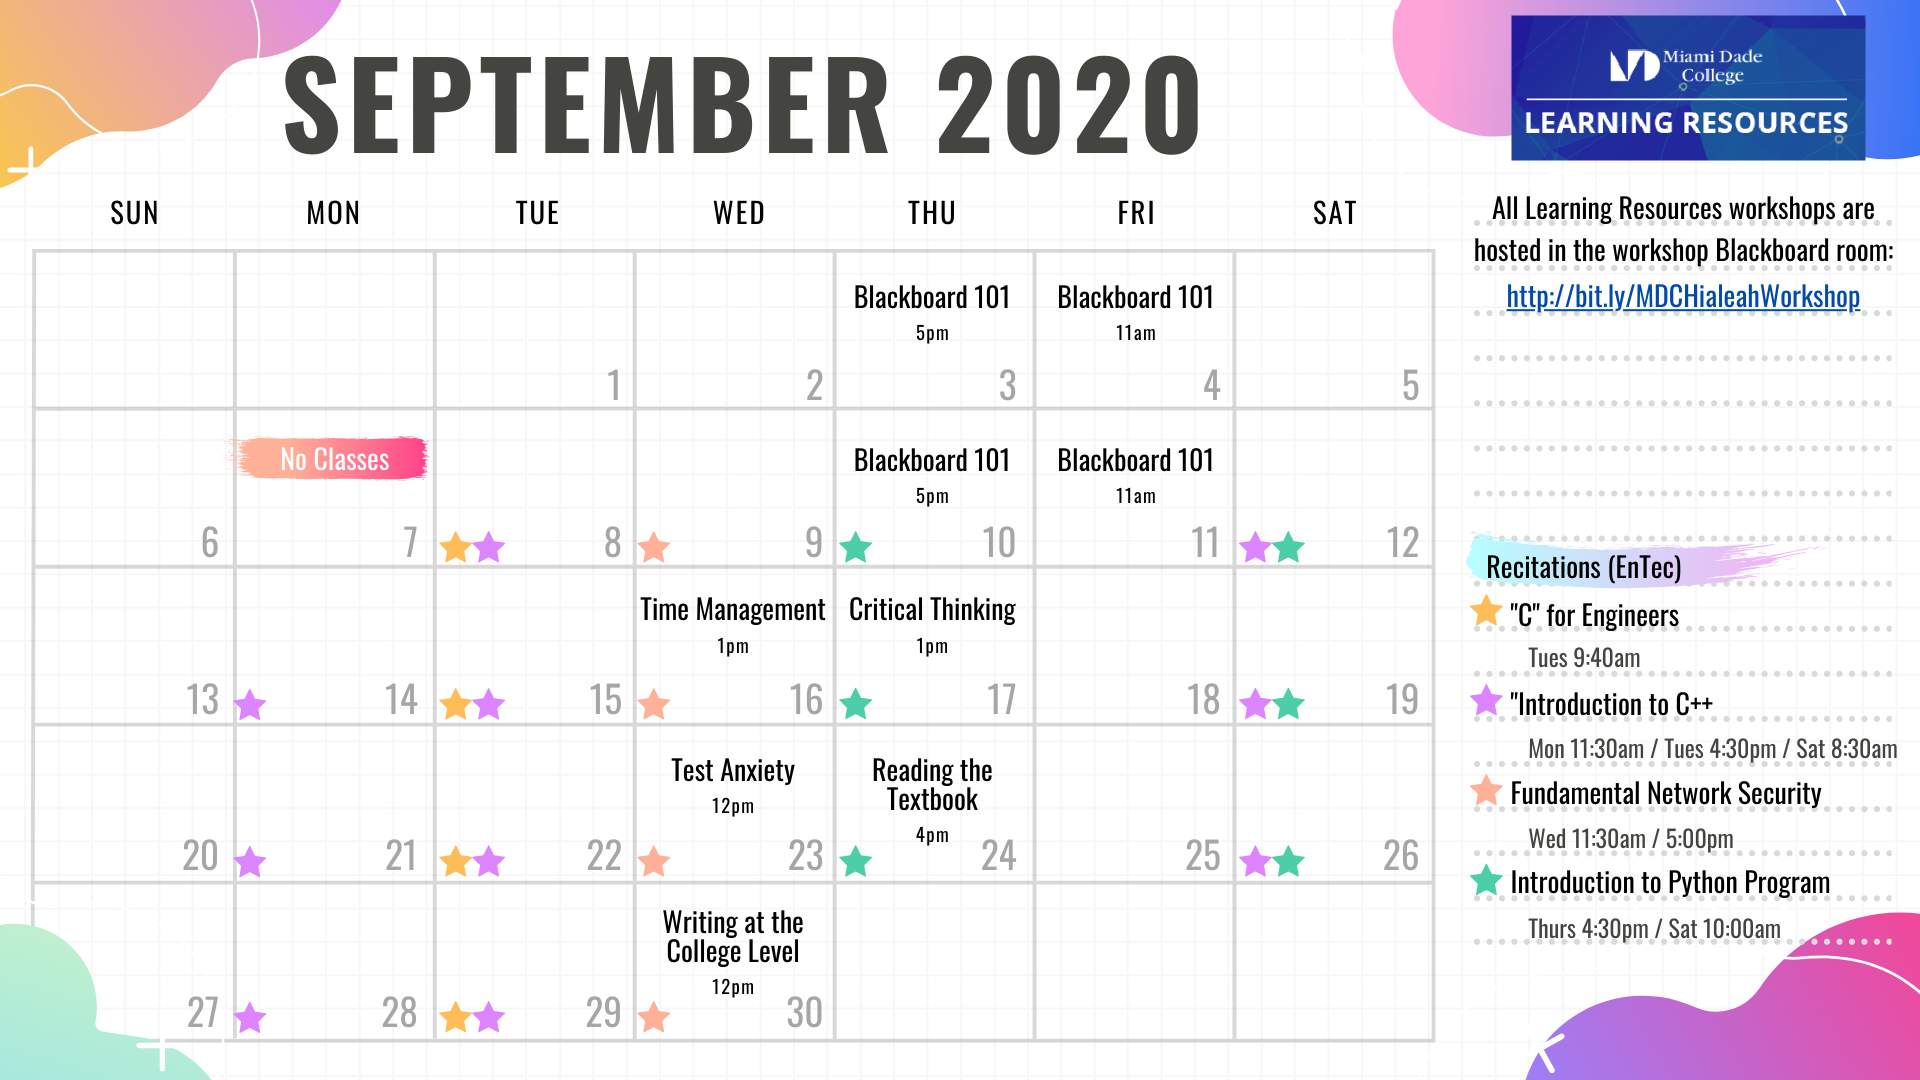 Monthly Workshops